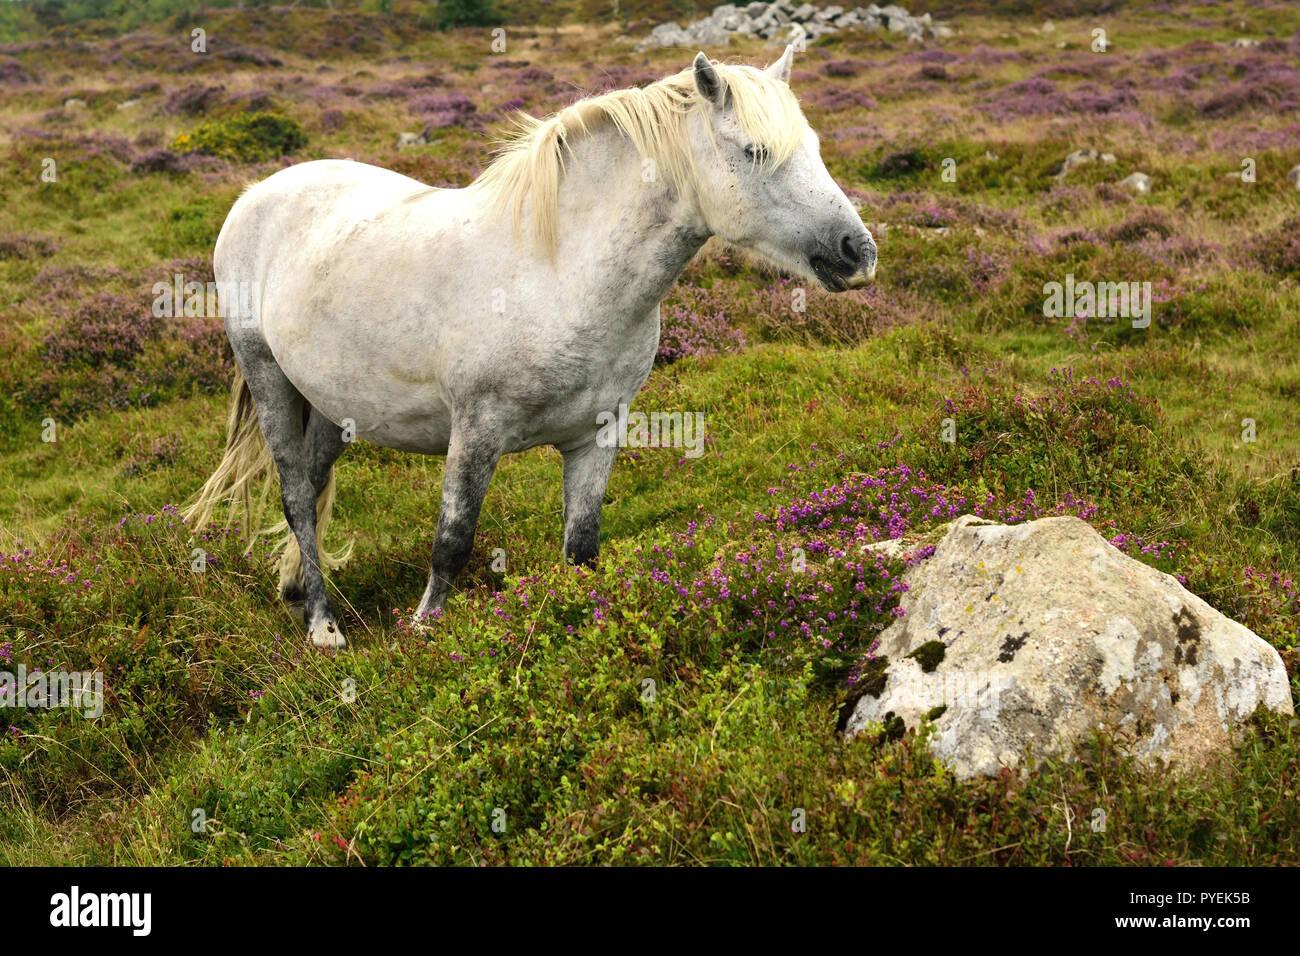 Dartmoor pony at Haytor. - Stock Image